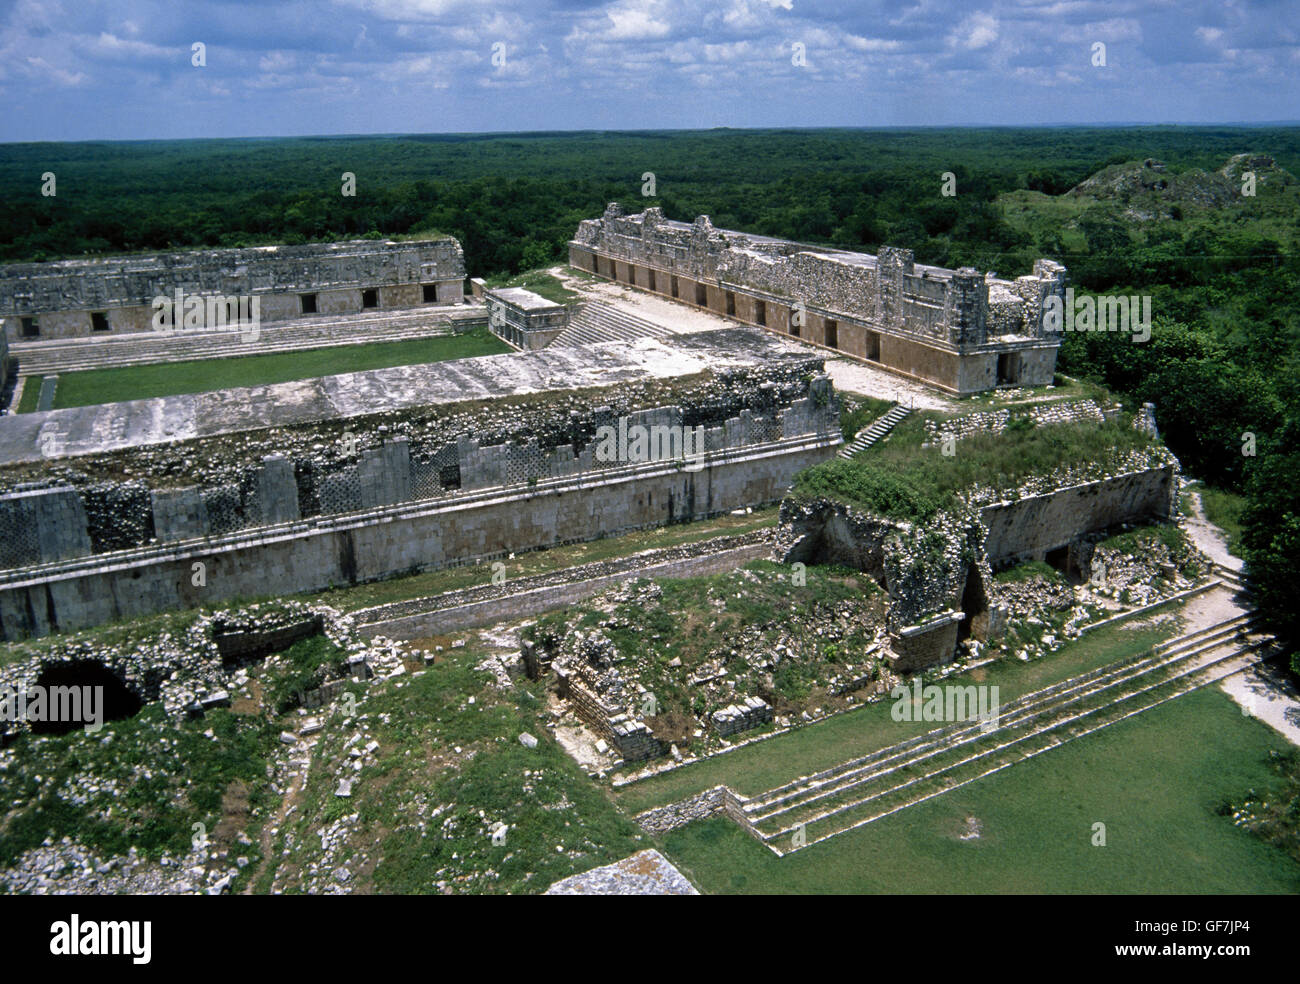 Maya civilization. Uxmal city. Puuc region. Yucatan. Mexico. - Stock Image